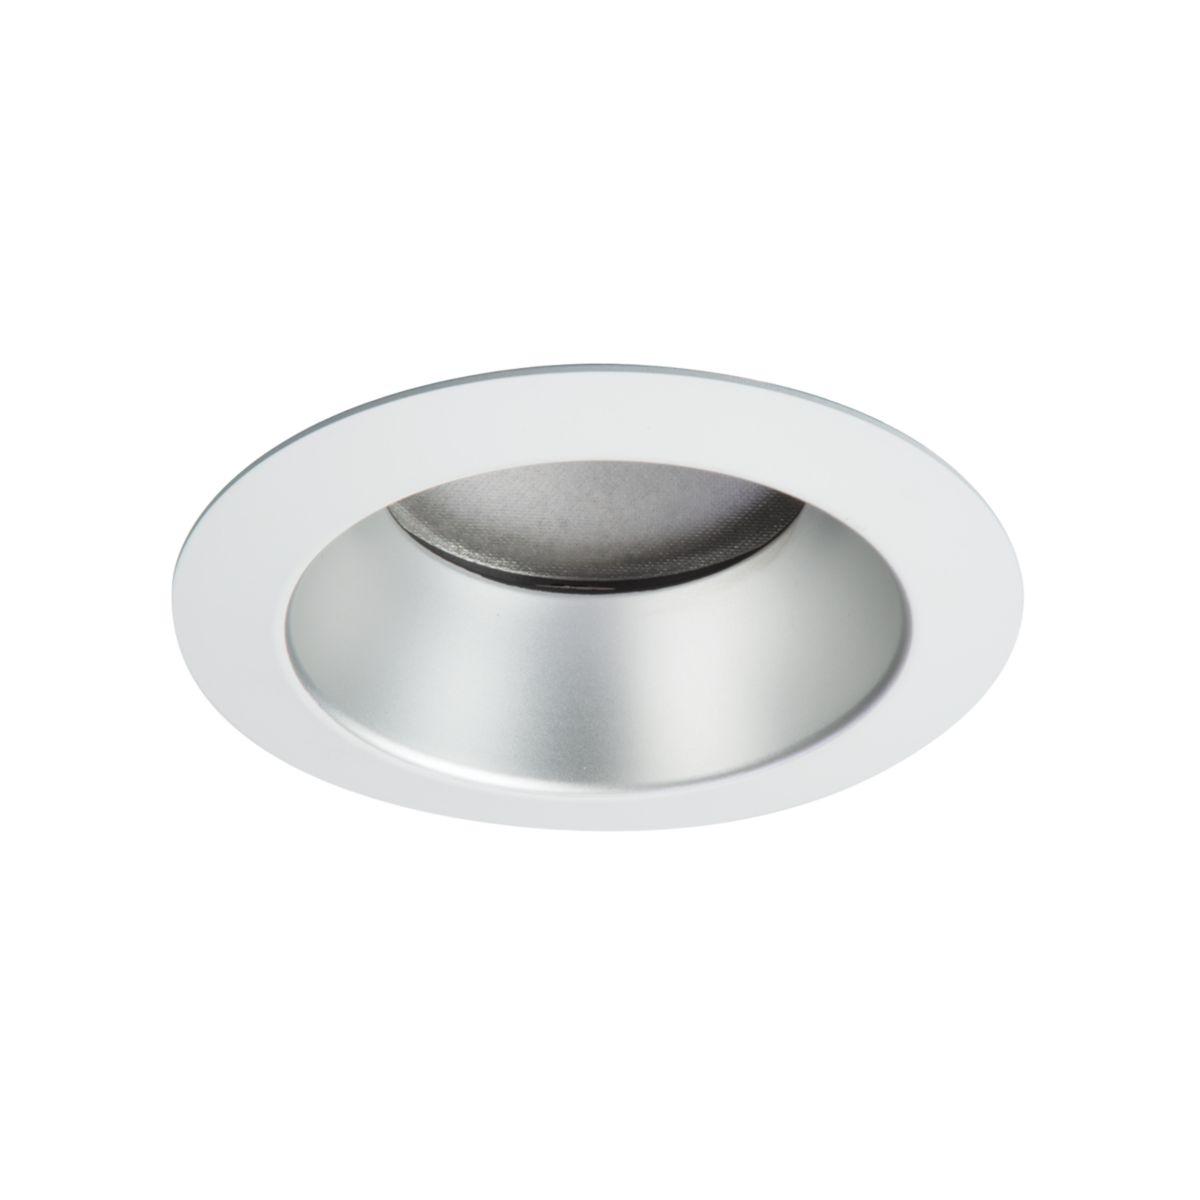 "LDA2B LED 2-3/4"" Adjustable/Slope Downlight"